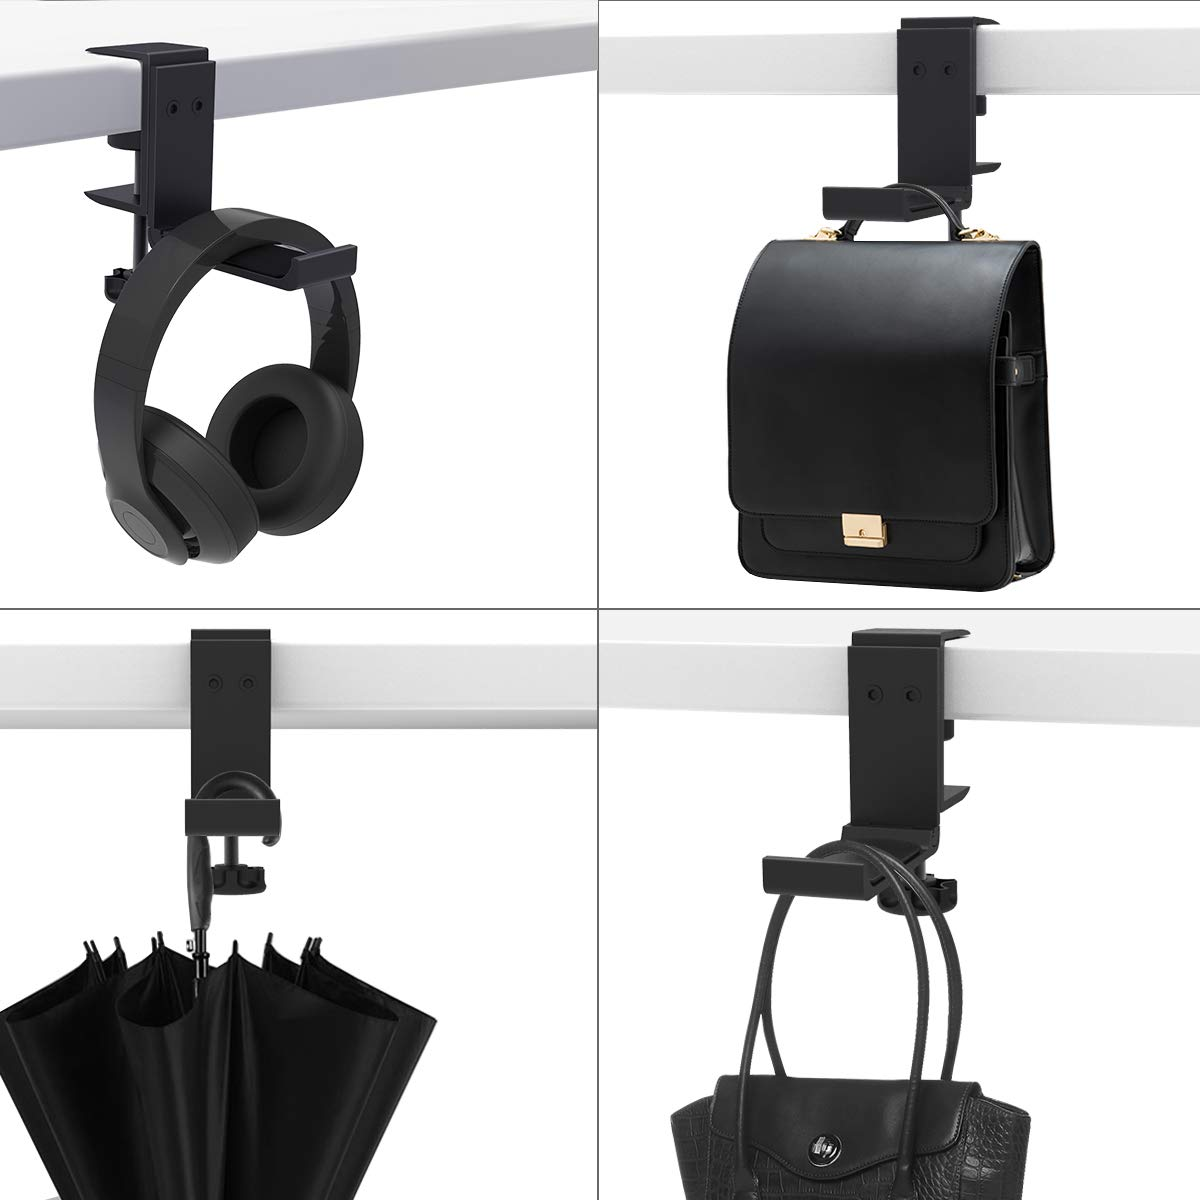 Universal Fit All Headphones Black Foldable Headphone Stand Hanger Holder Bracket Aluminum Headphones Headset Clamp Hook Under Desk Space Save Mount Fold Upward Not in Use